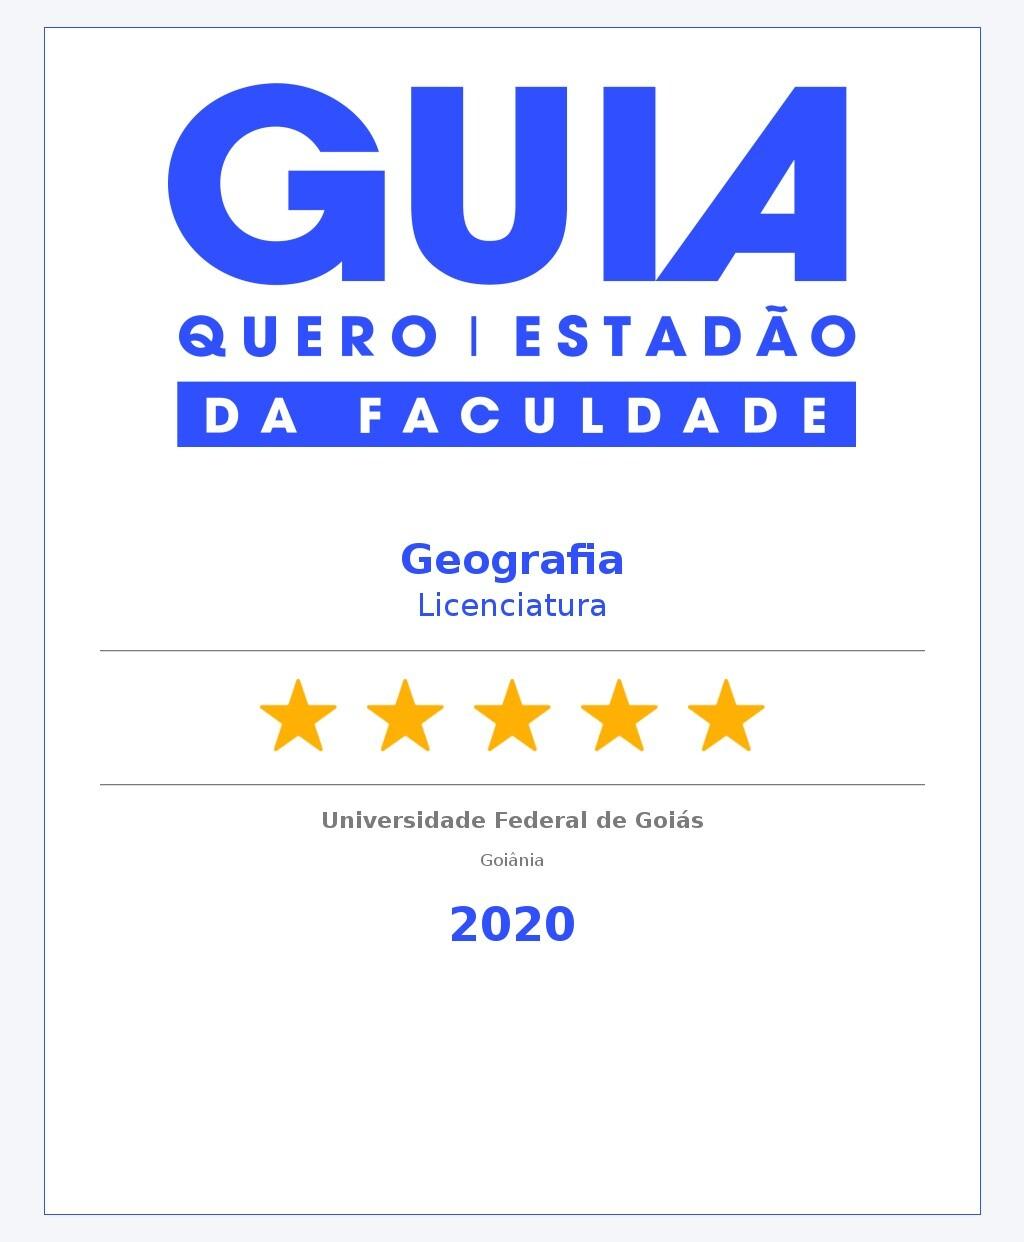 2020 - Conceito Curso Geografia Licenciatura no Estadao